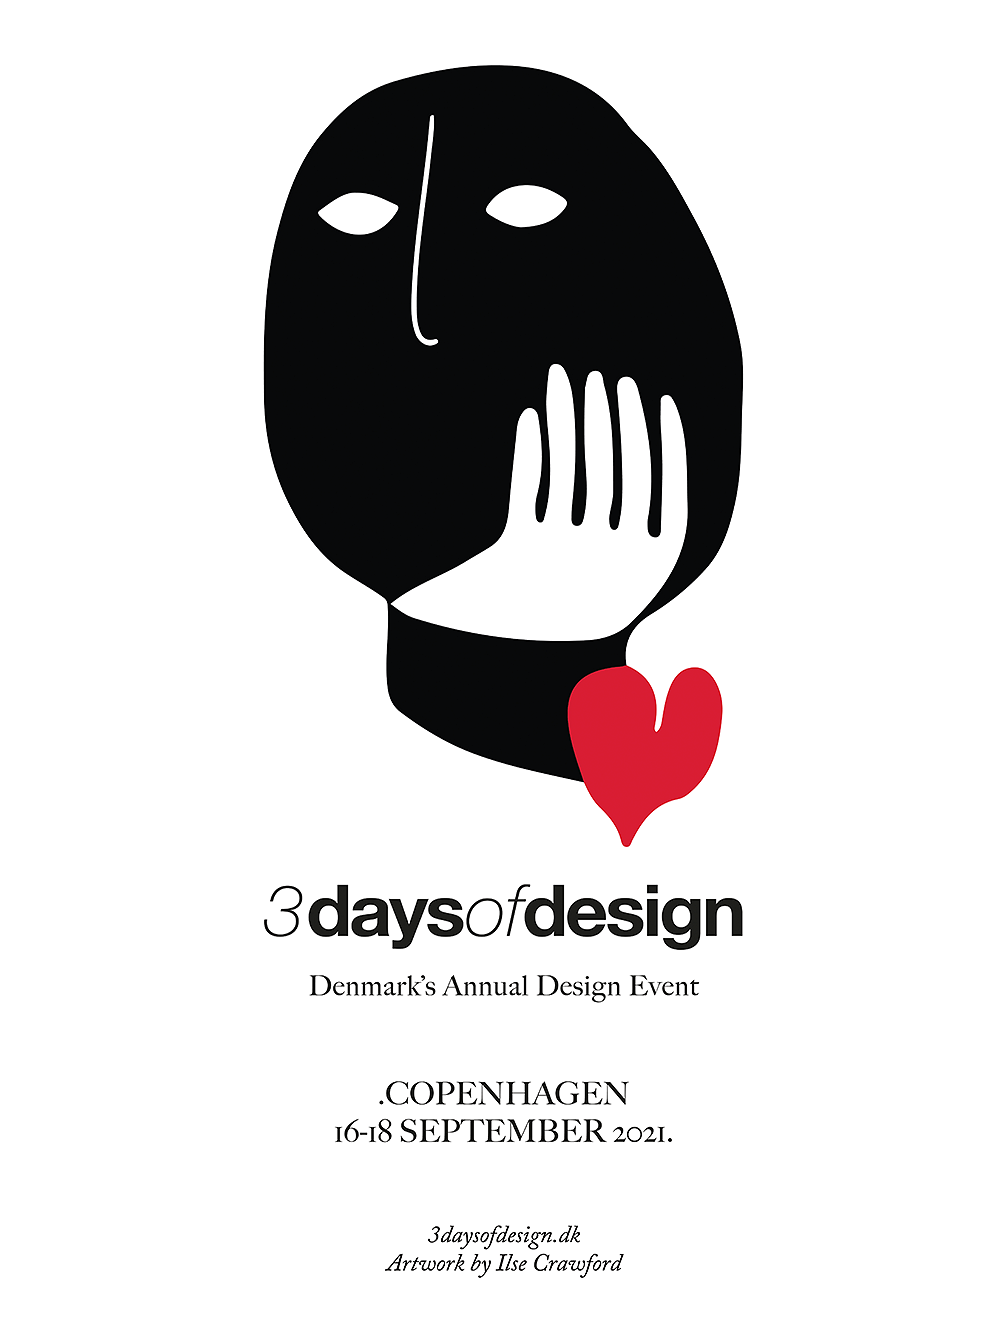 3 Days of Design 2021